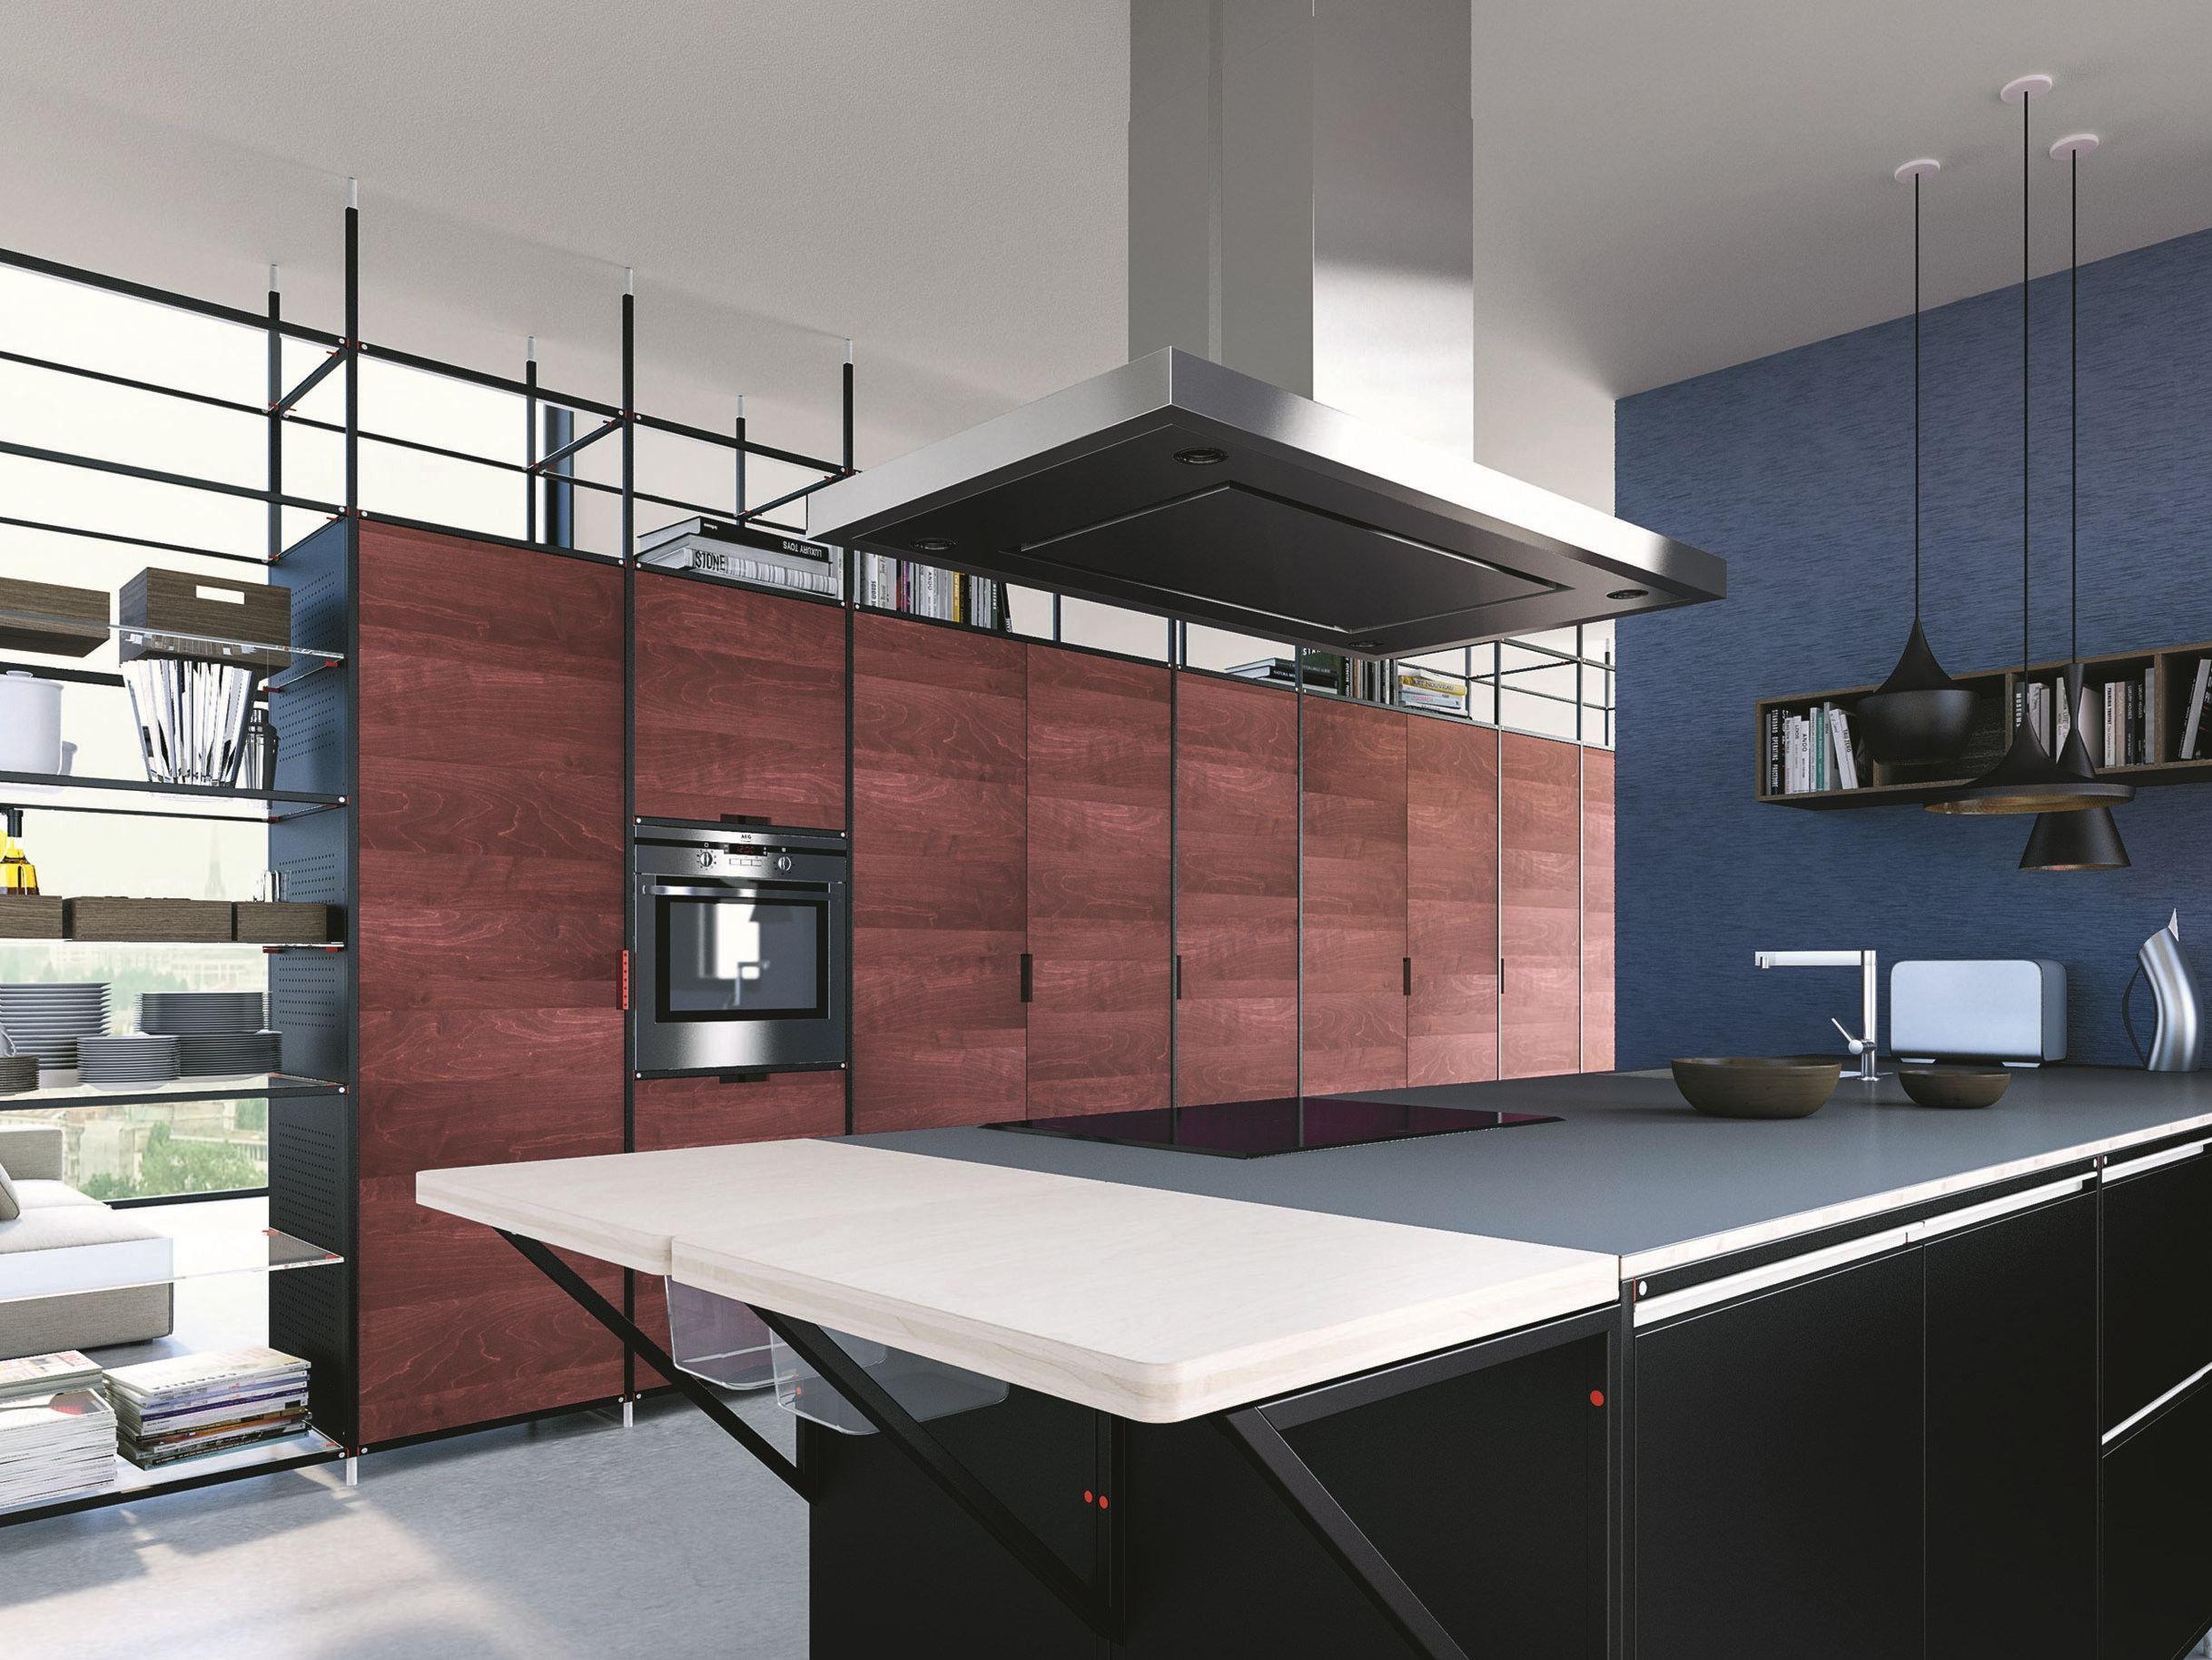 cuisine int gr e en bois multi niveau meccanica by valcucine design gabriele centazzo. Black Bedroom Furniture Sets. Home Design Ideas